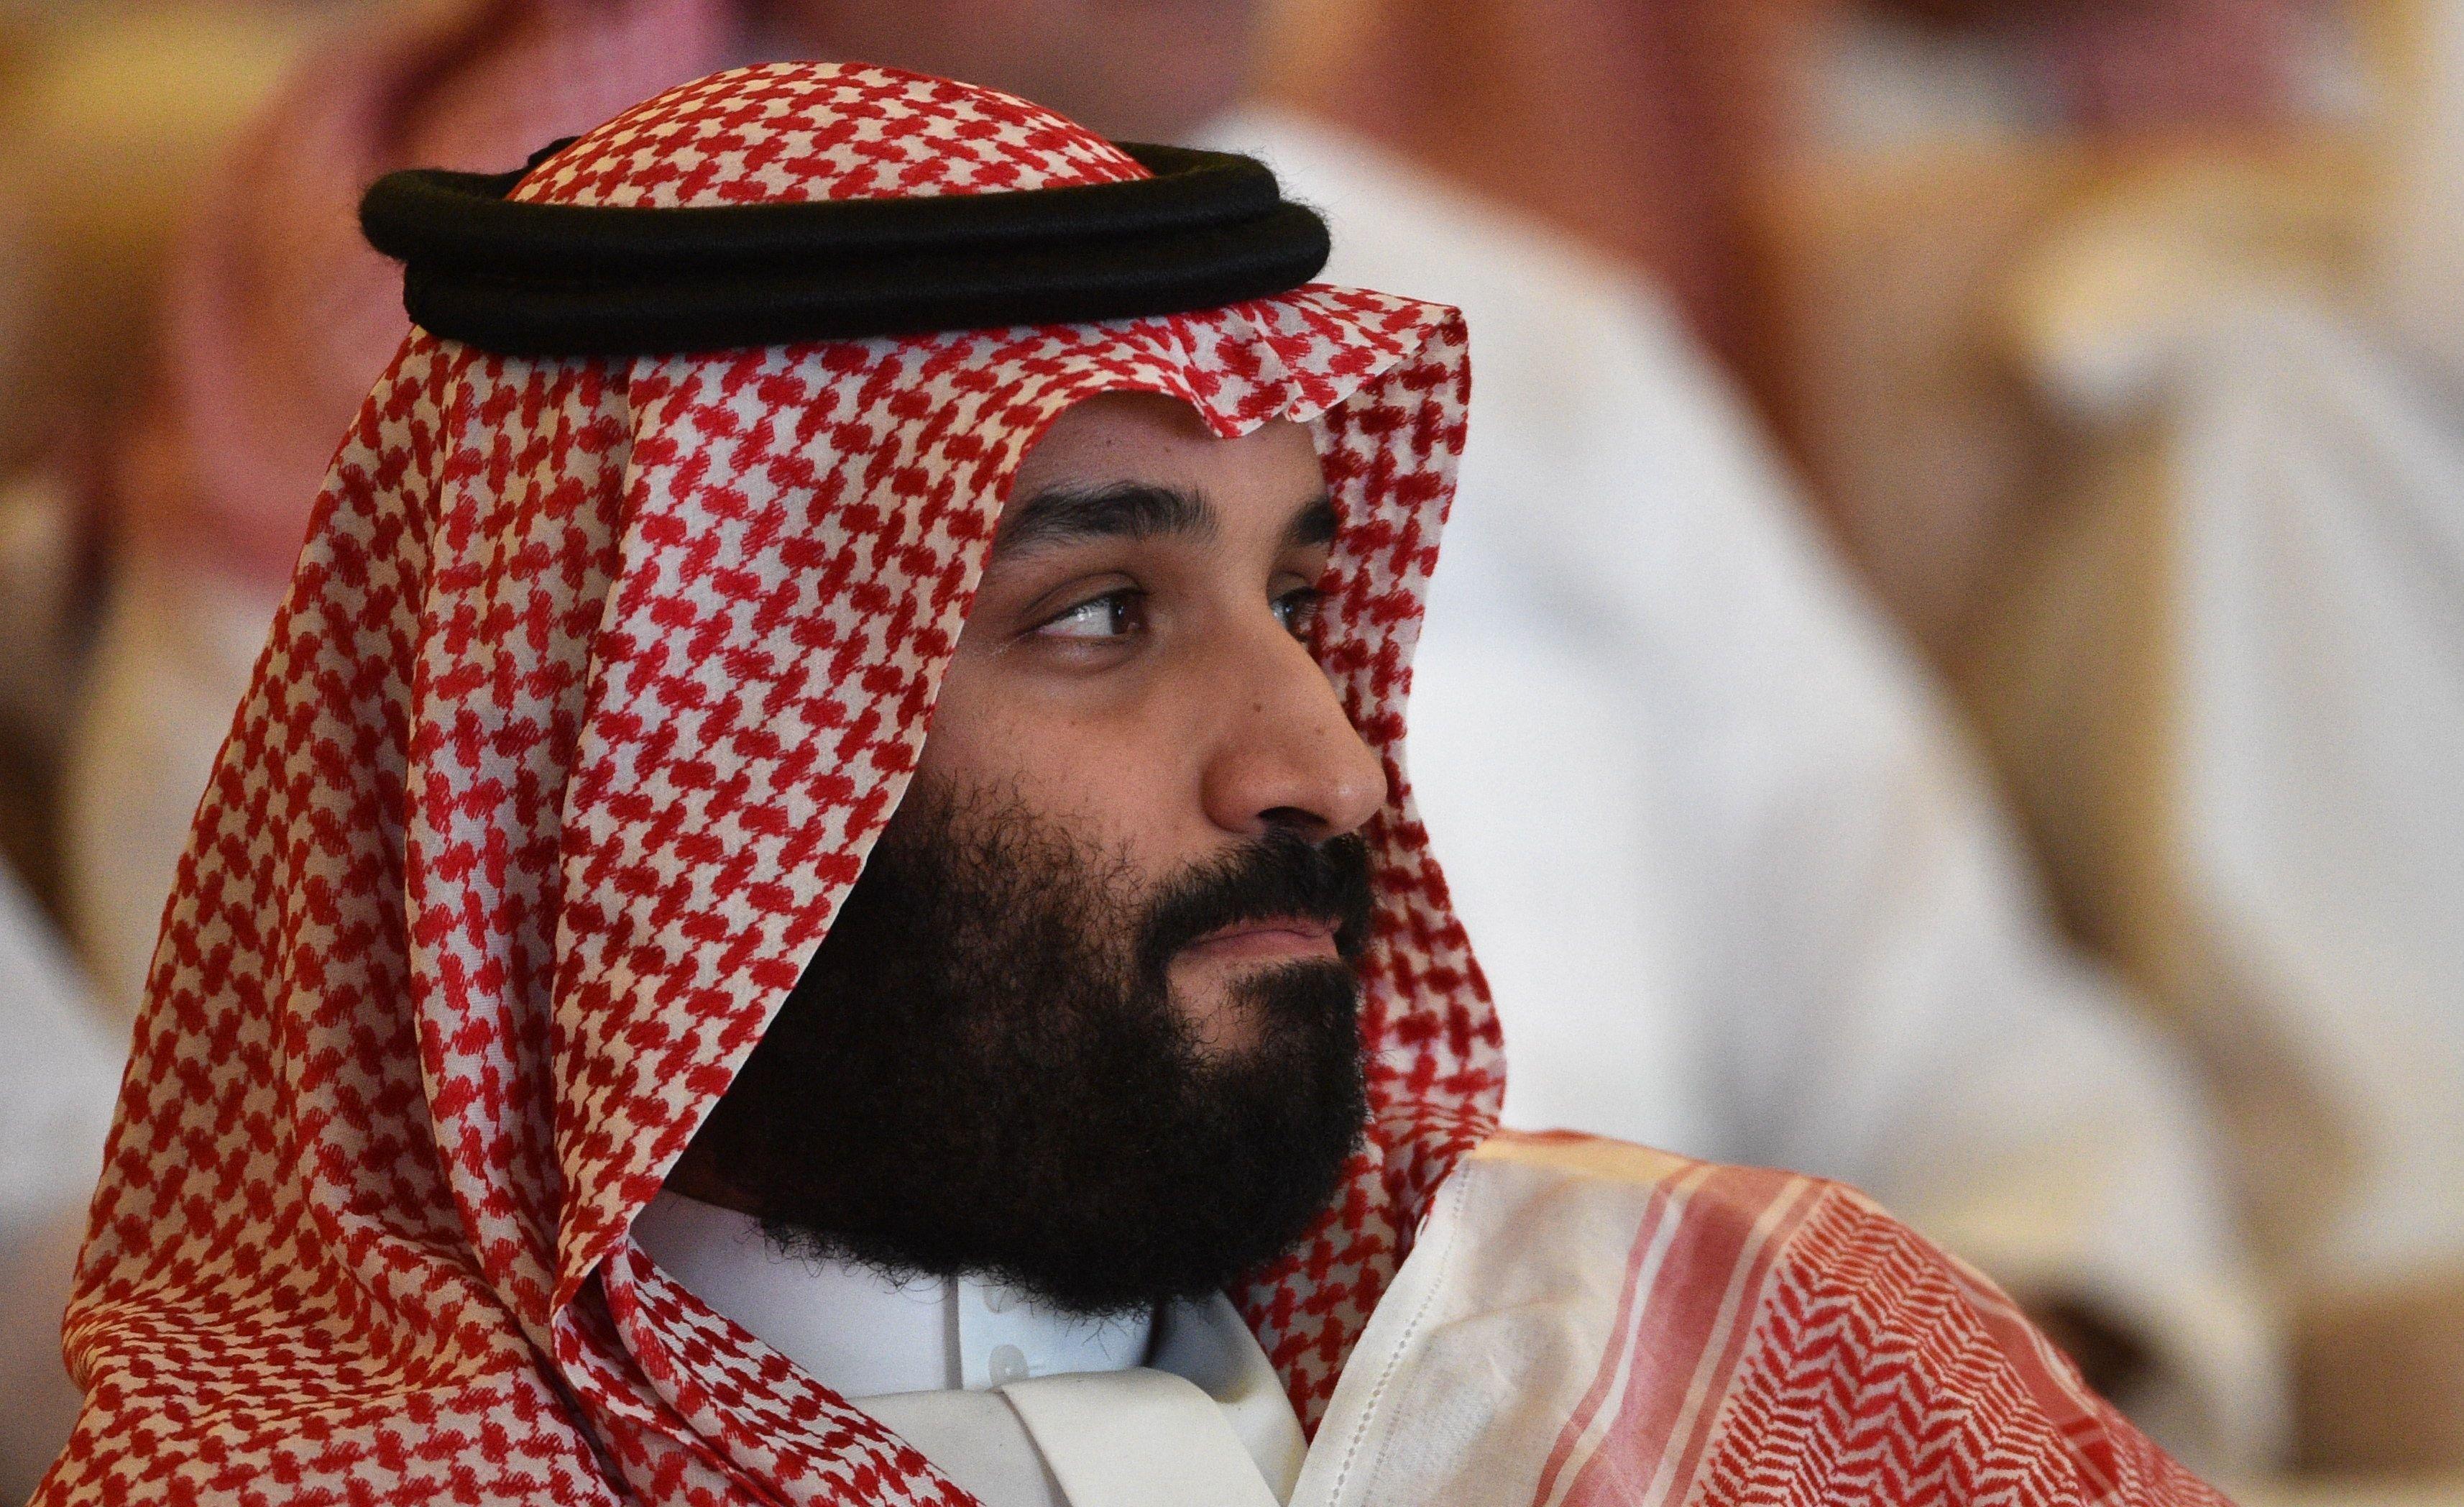 Saudi Arabia Allegedly Tortured Women's Rights Activists Before Khashoggi